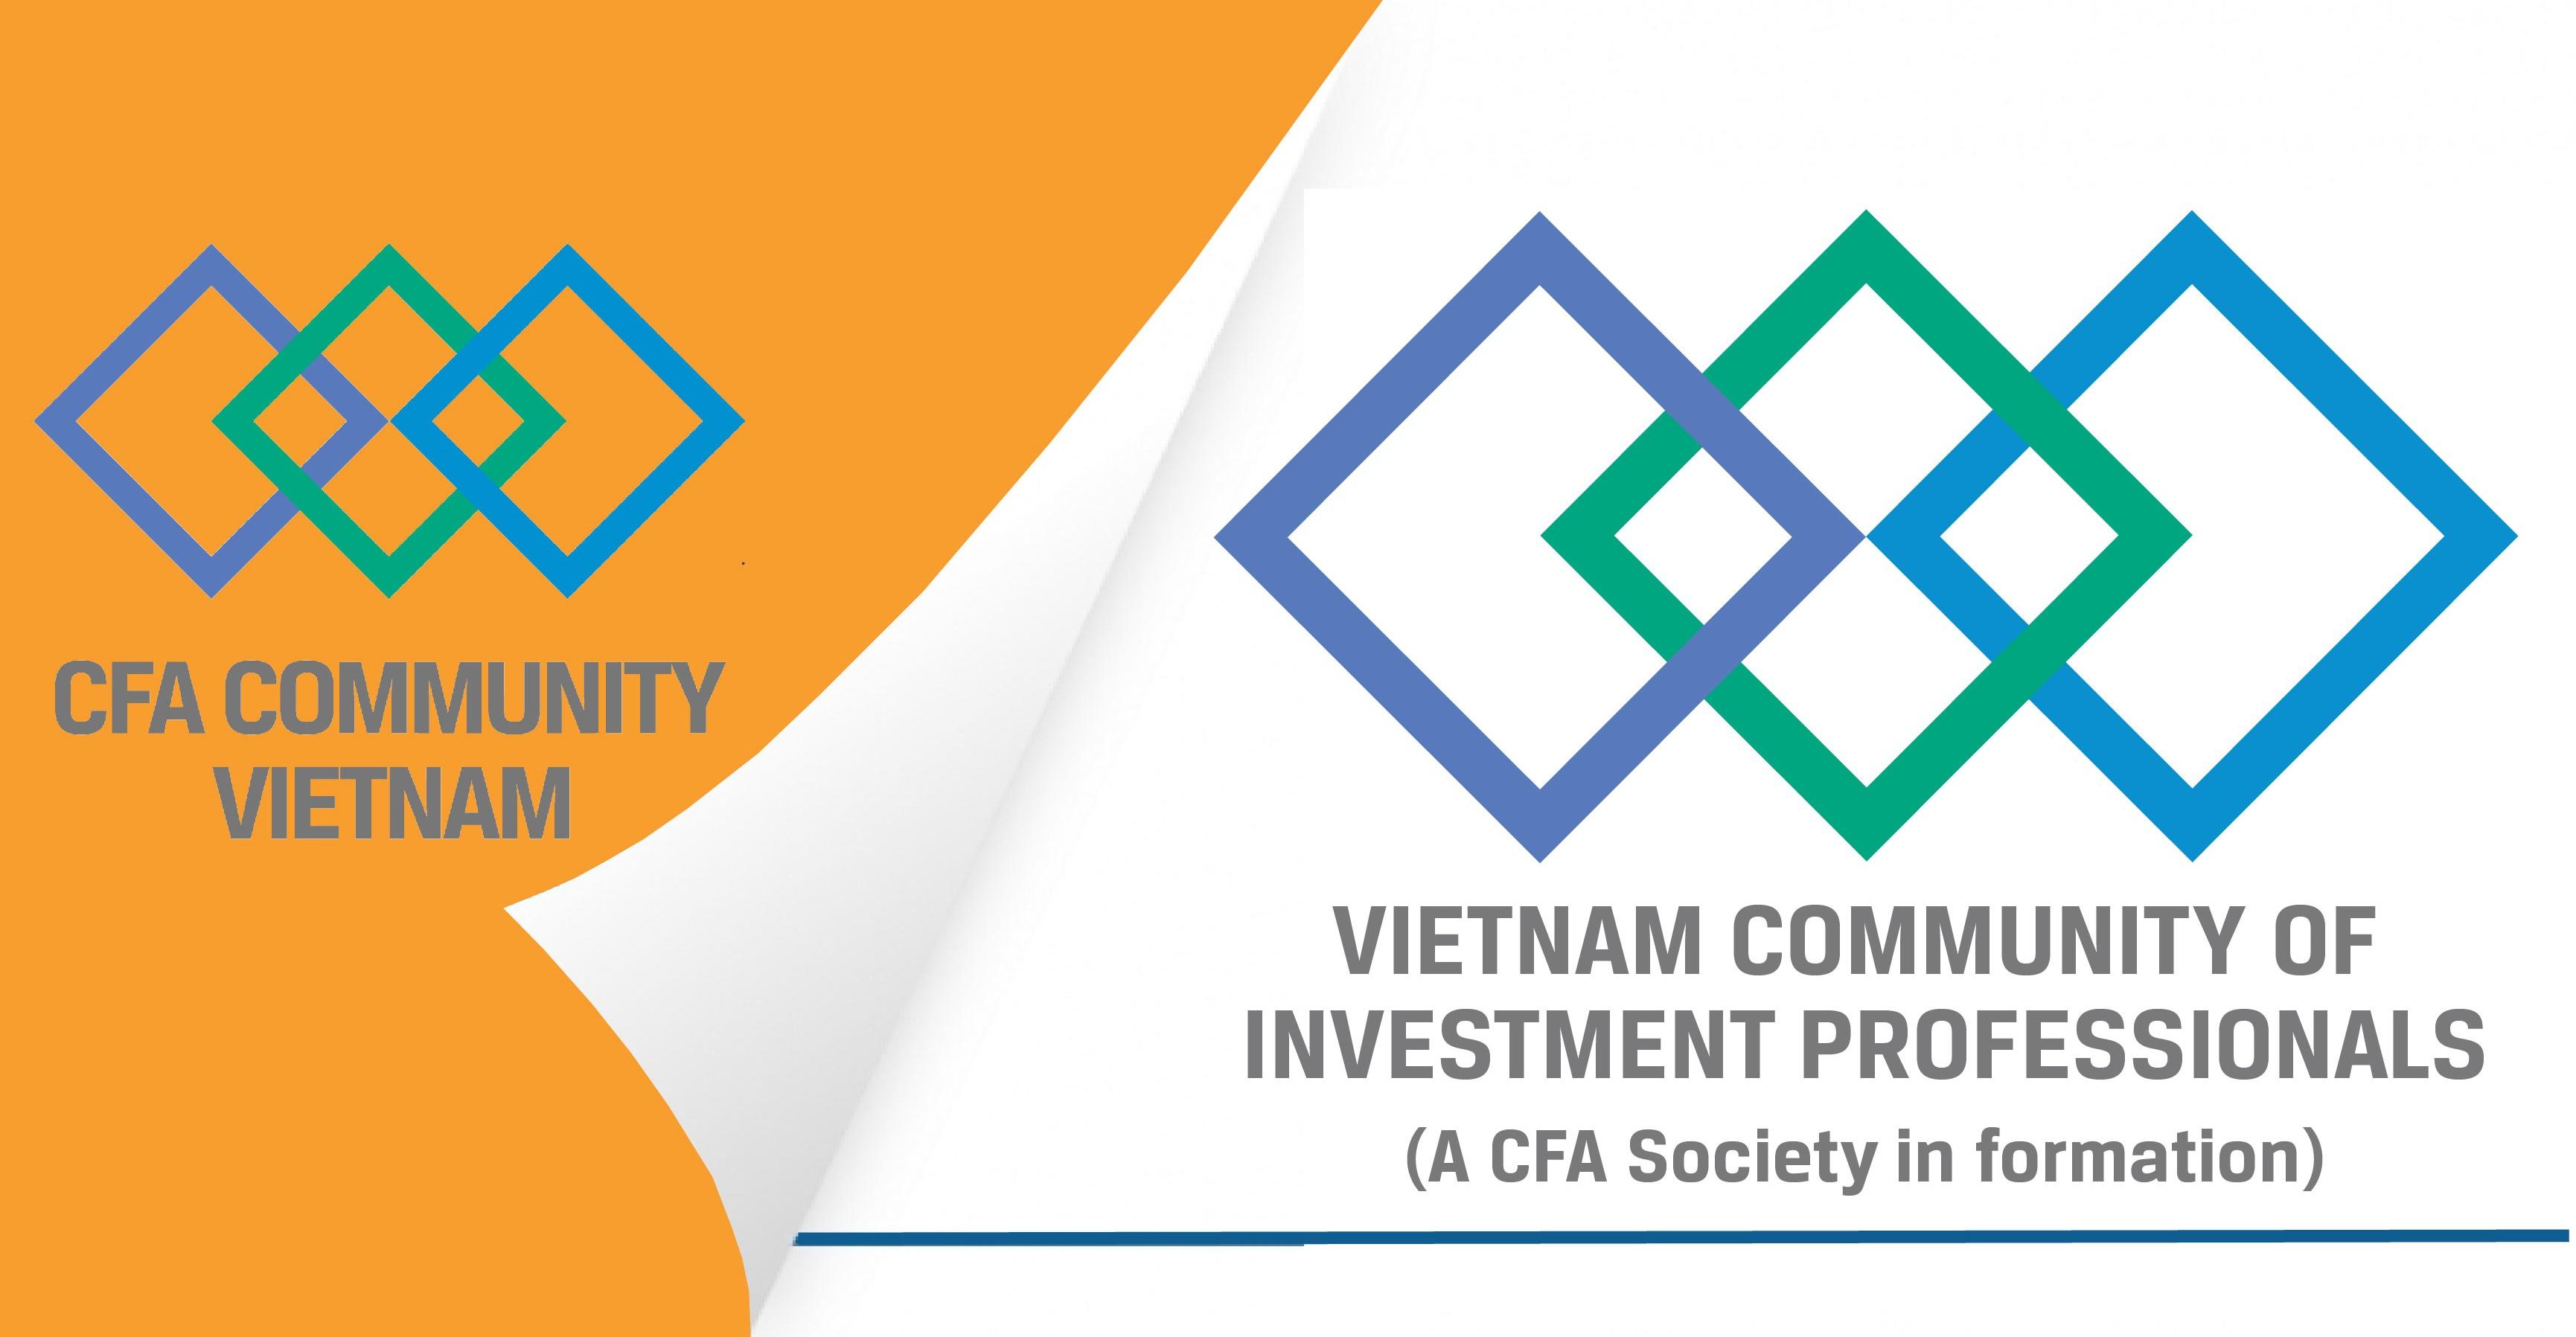 Ảnh 3: CFA Community Vietnam